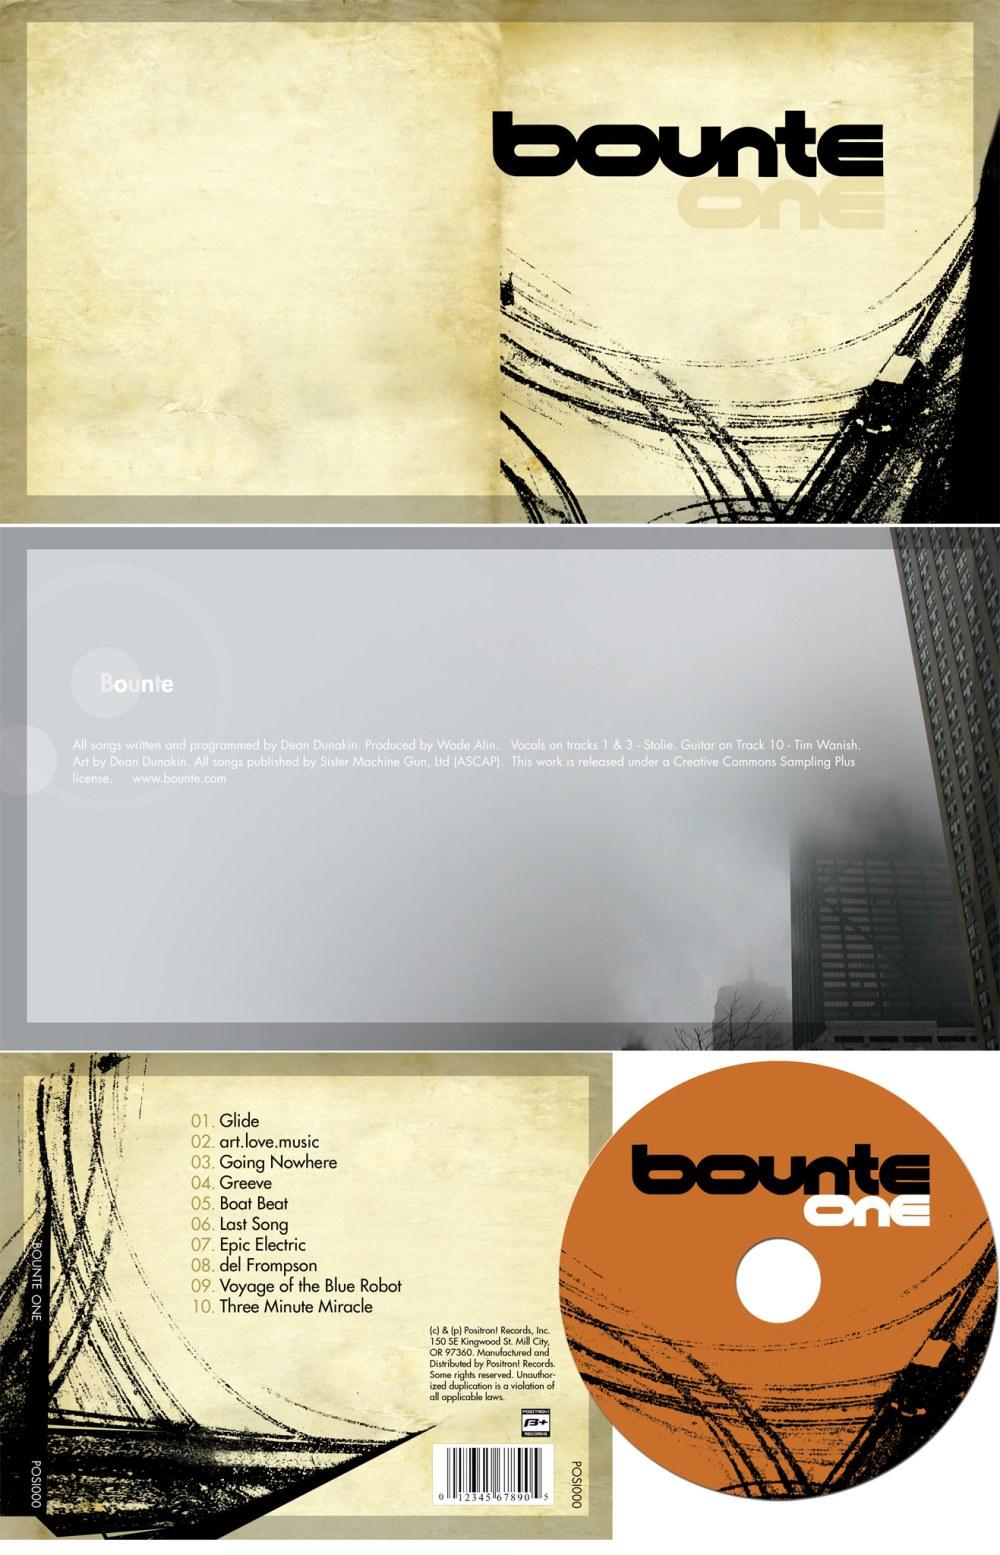 Bounte: One album